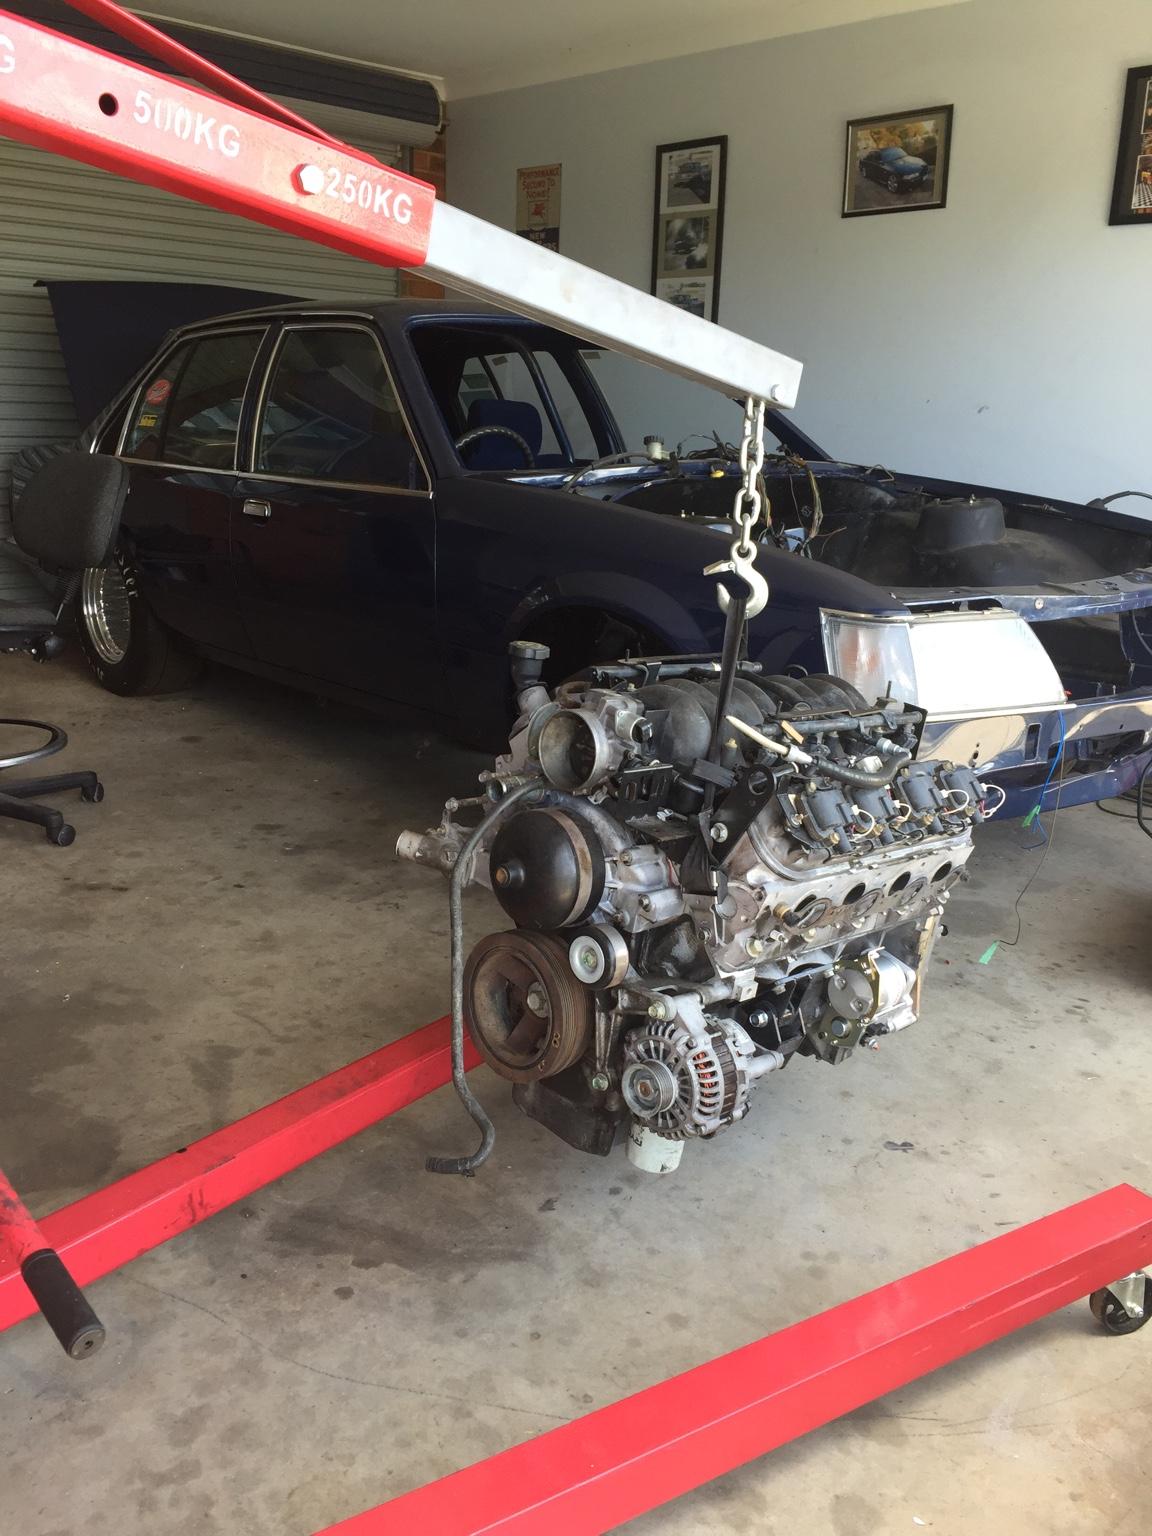 Aussie V8   Holden - Ford   Australian V8 Engine Community